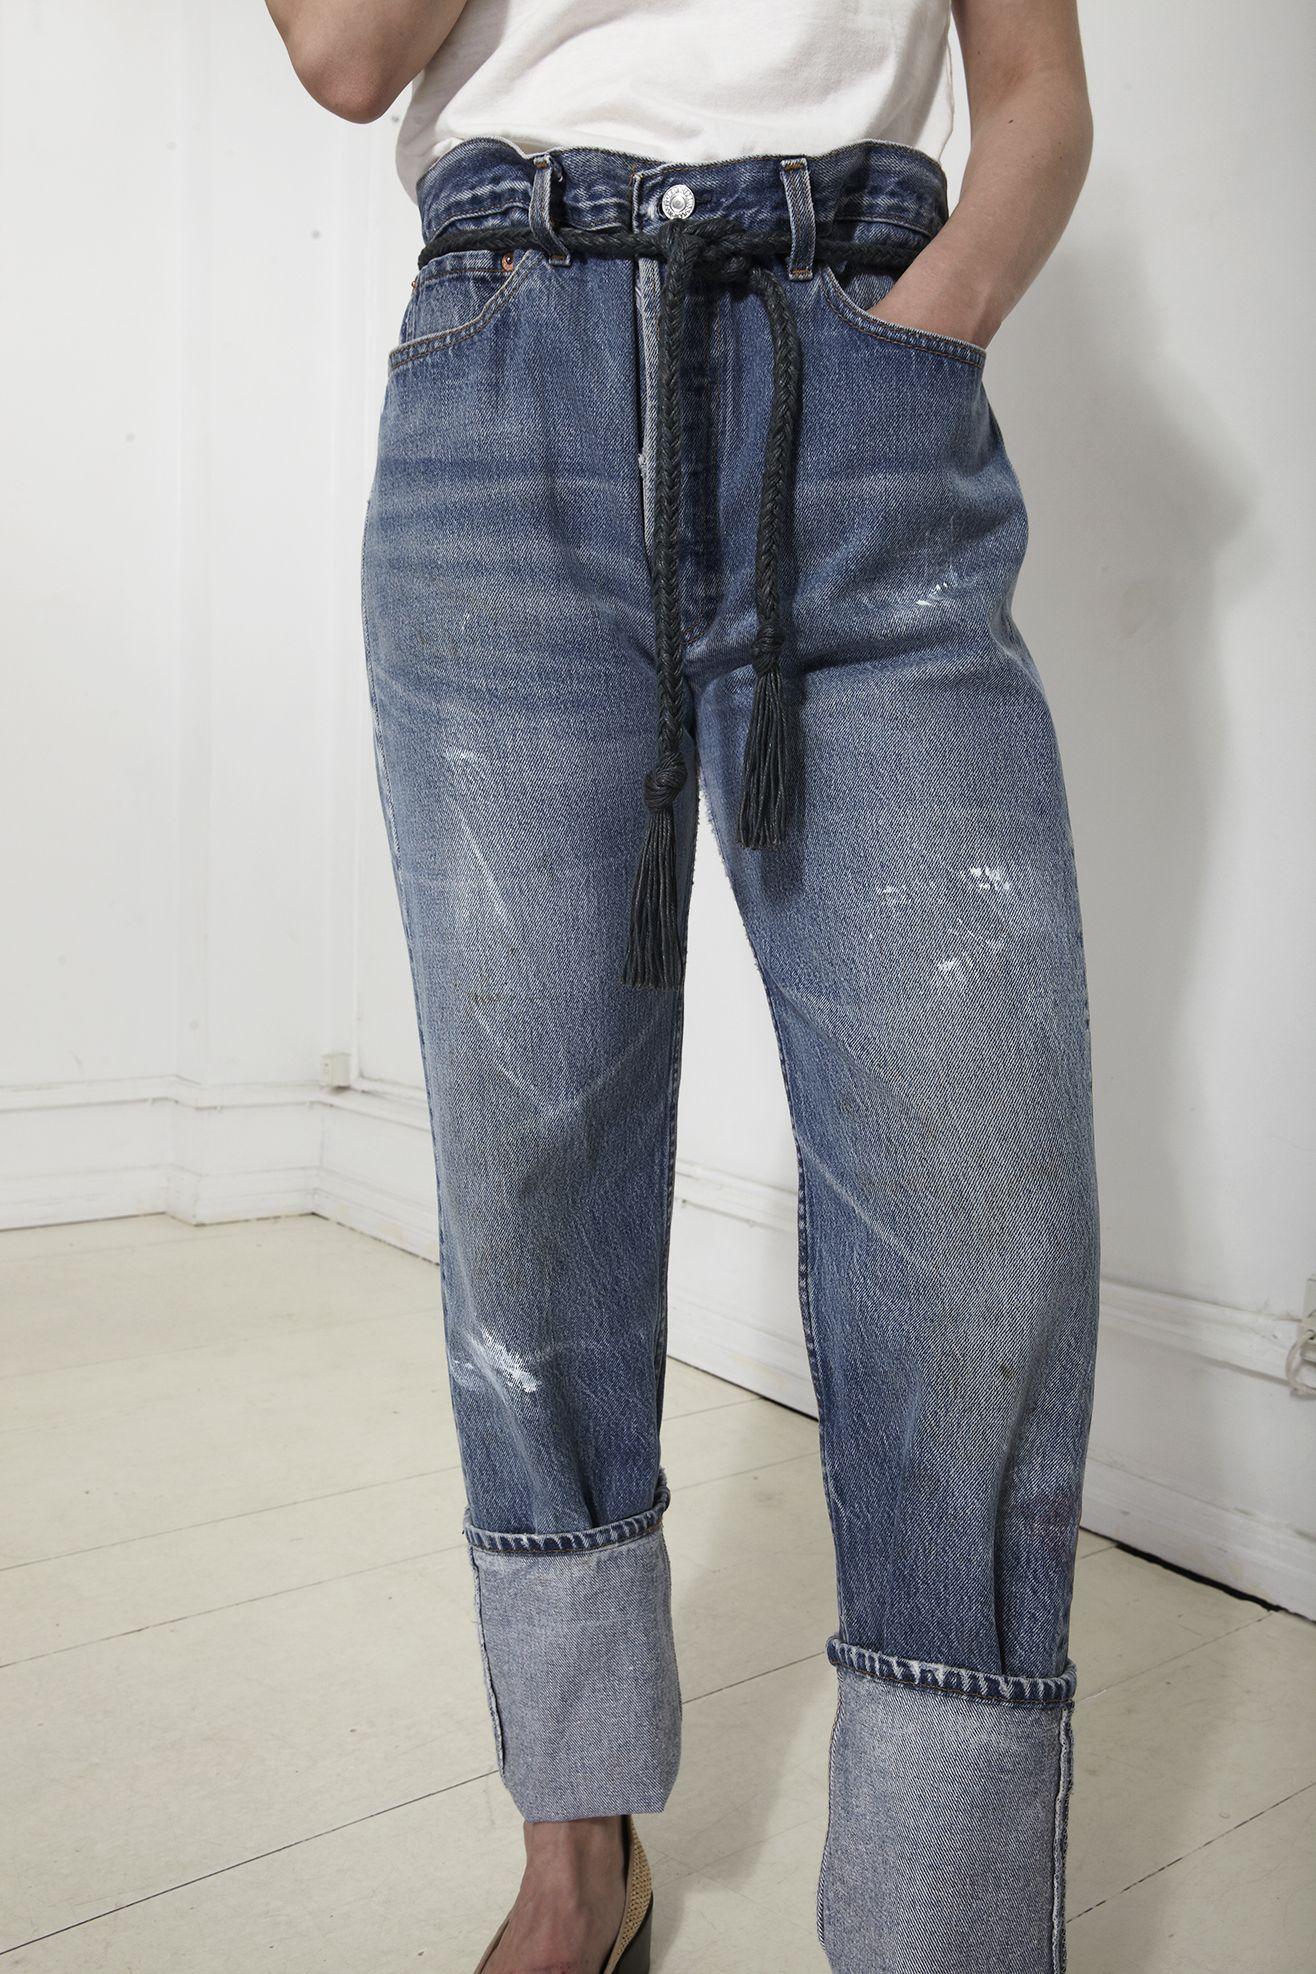 Waist cinching jeans